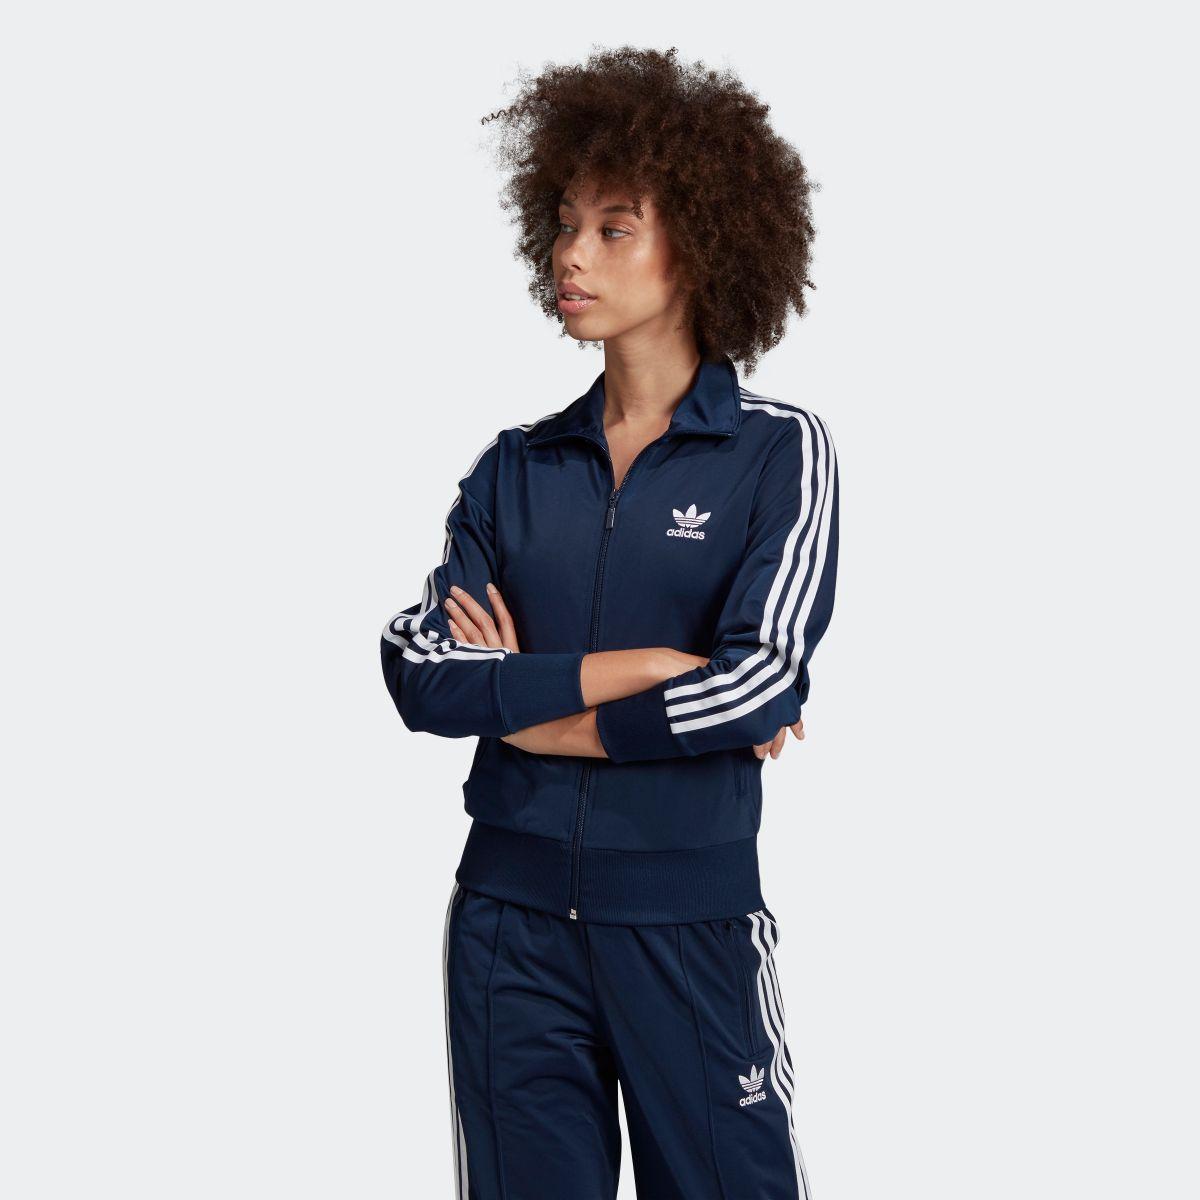 adidas sportswear ladies